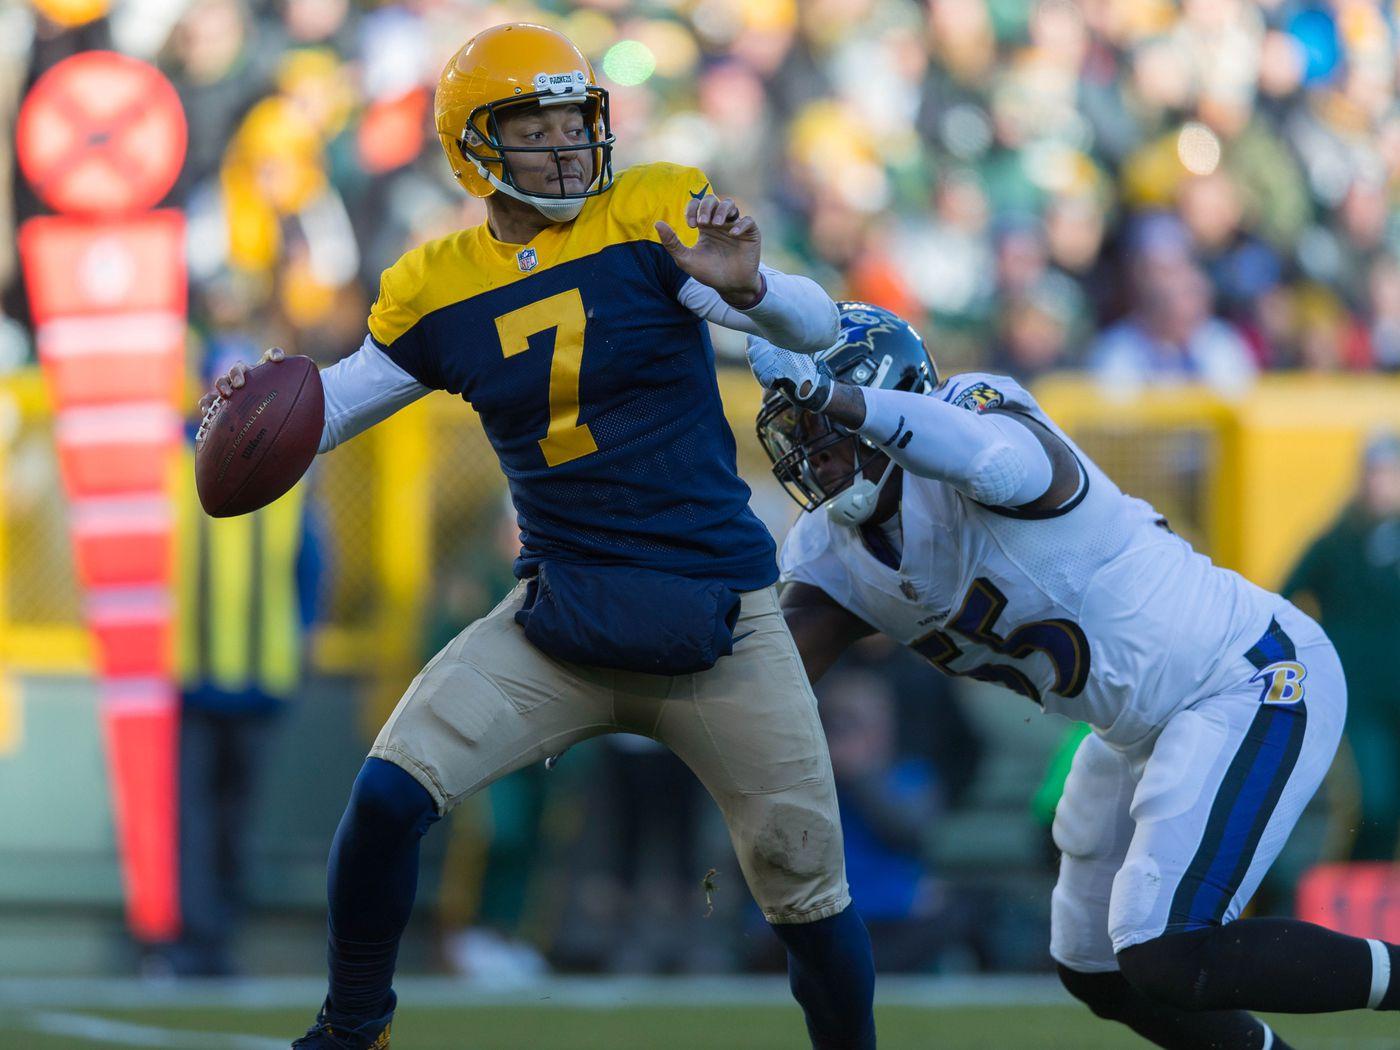 half off 0c8da 5728b NFL allows teams to wear throwback jerseys for three games ...